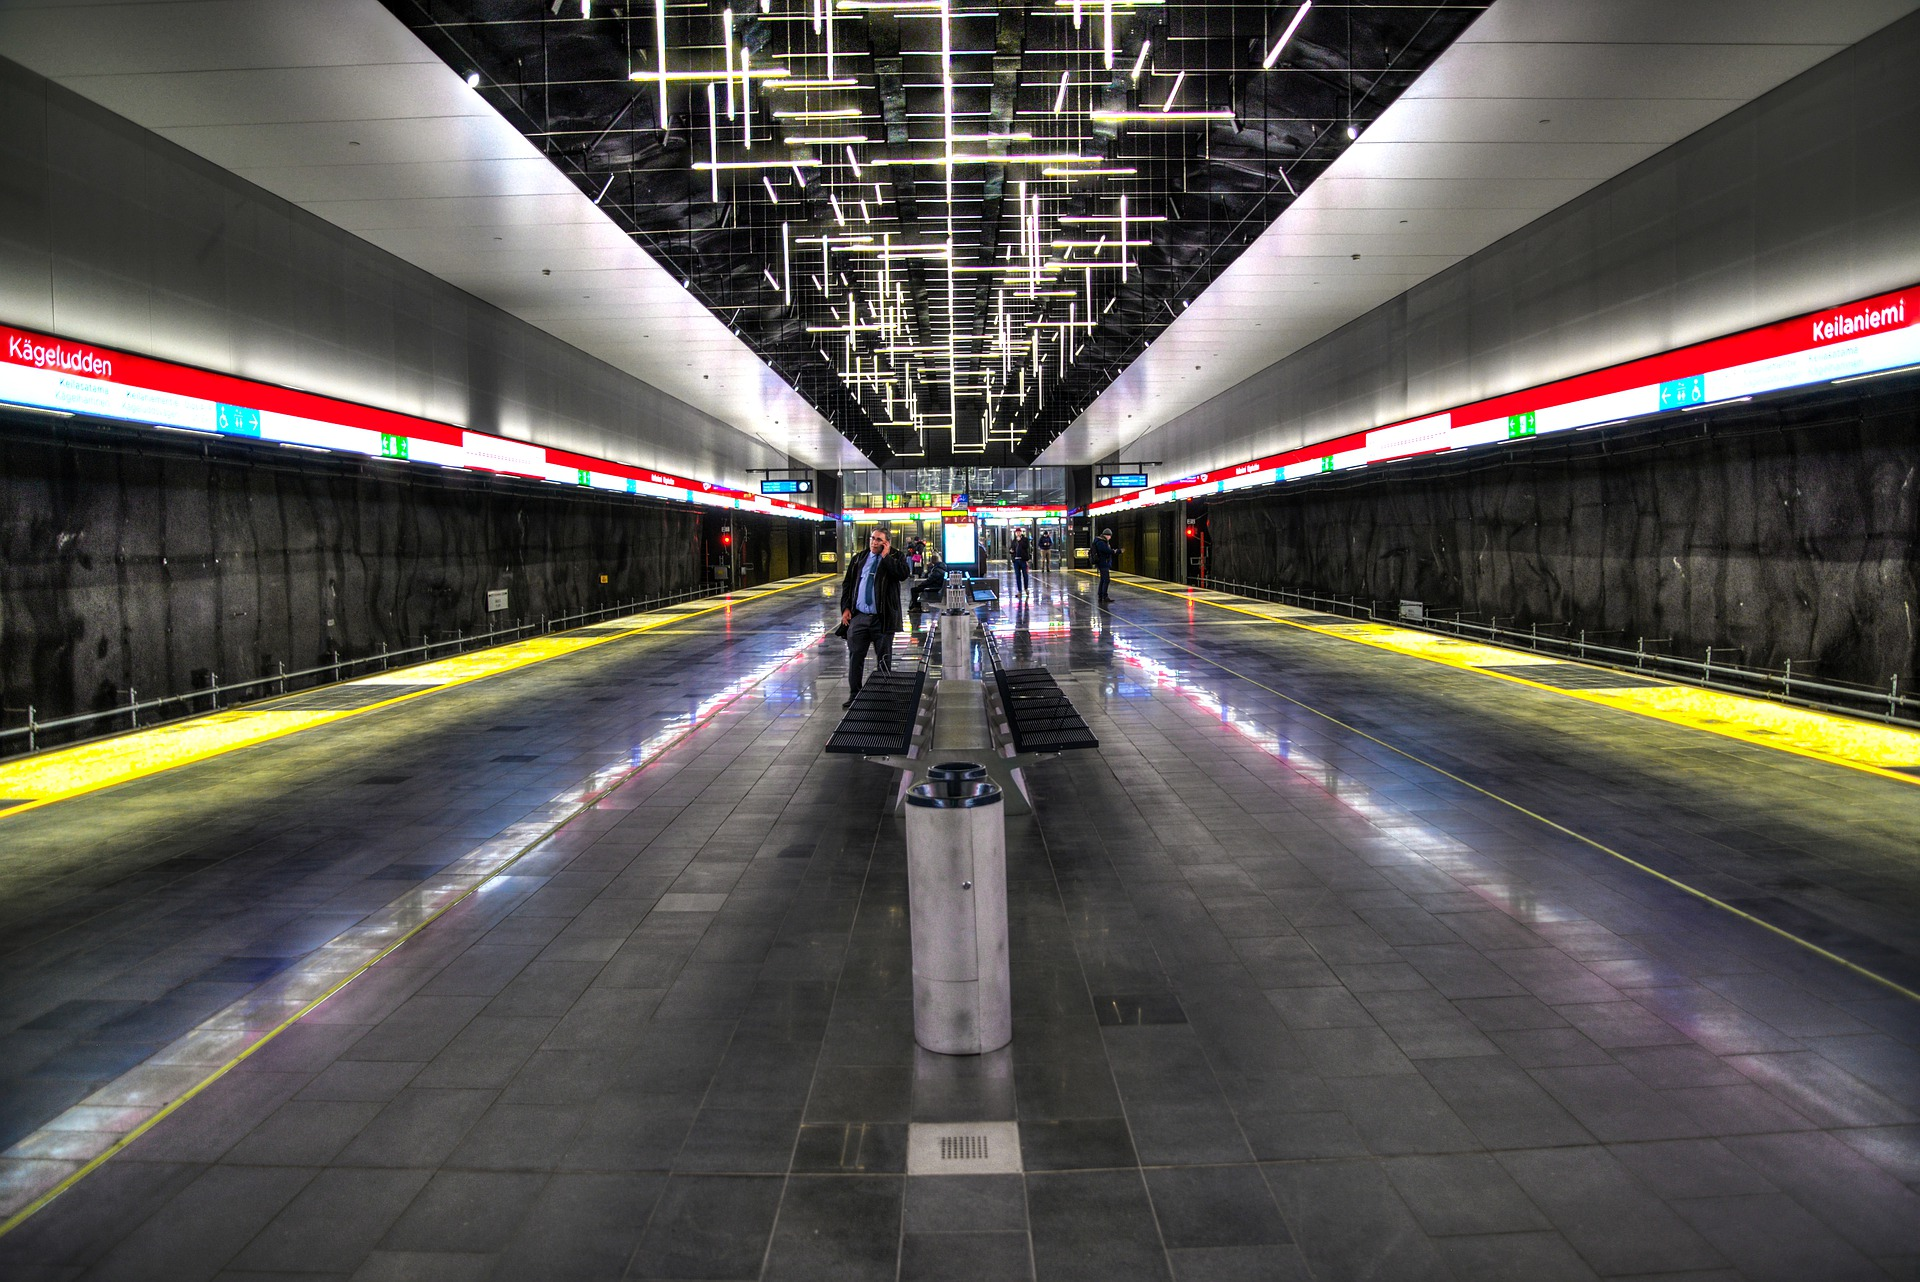 Metroasema Keilaniemi